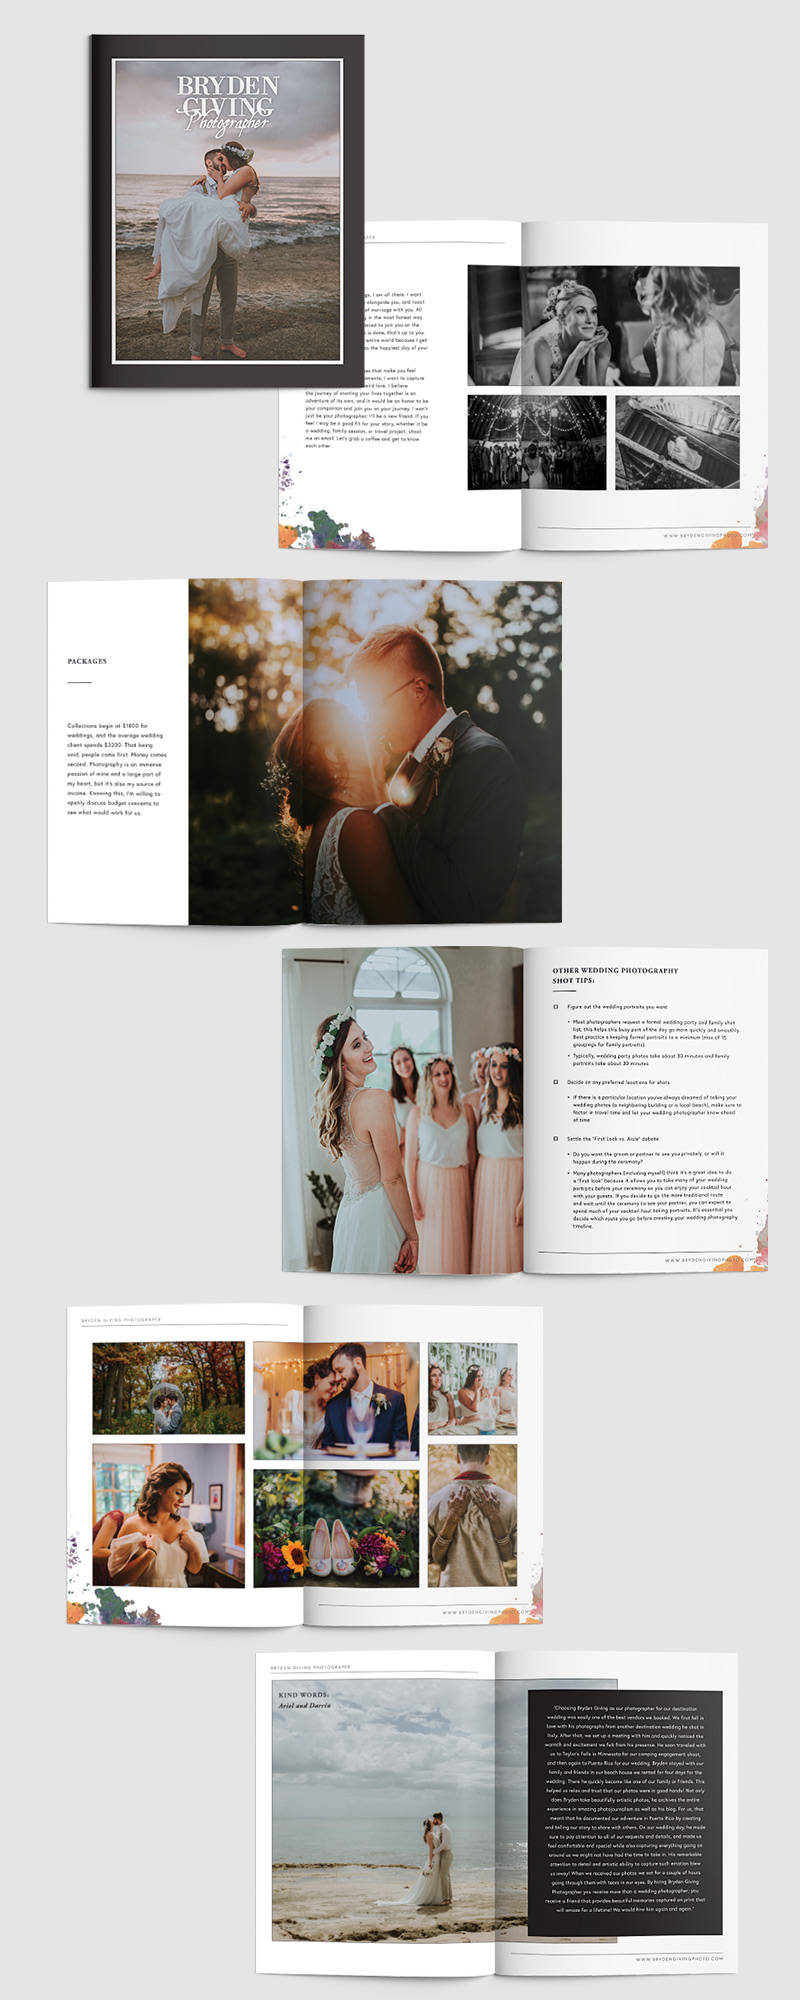 Wedding magazine design for a photographer | Jodi Neufeld Design